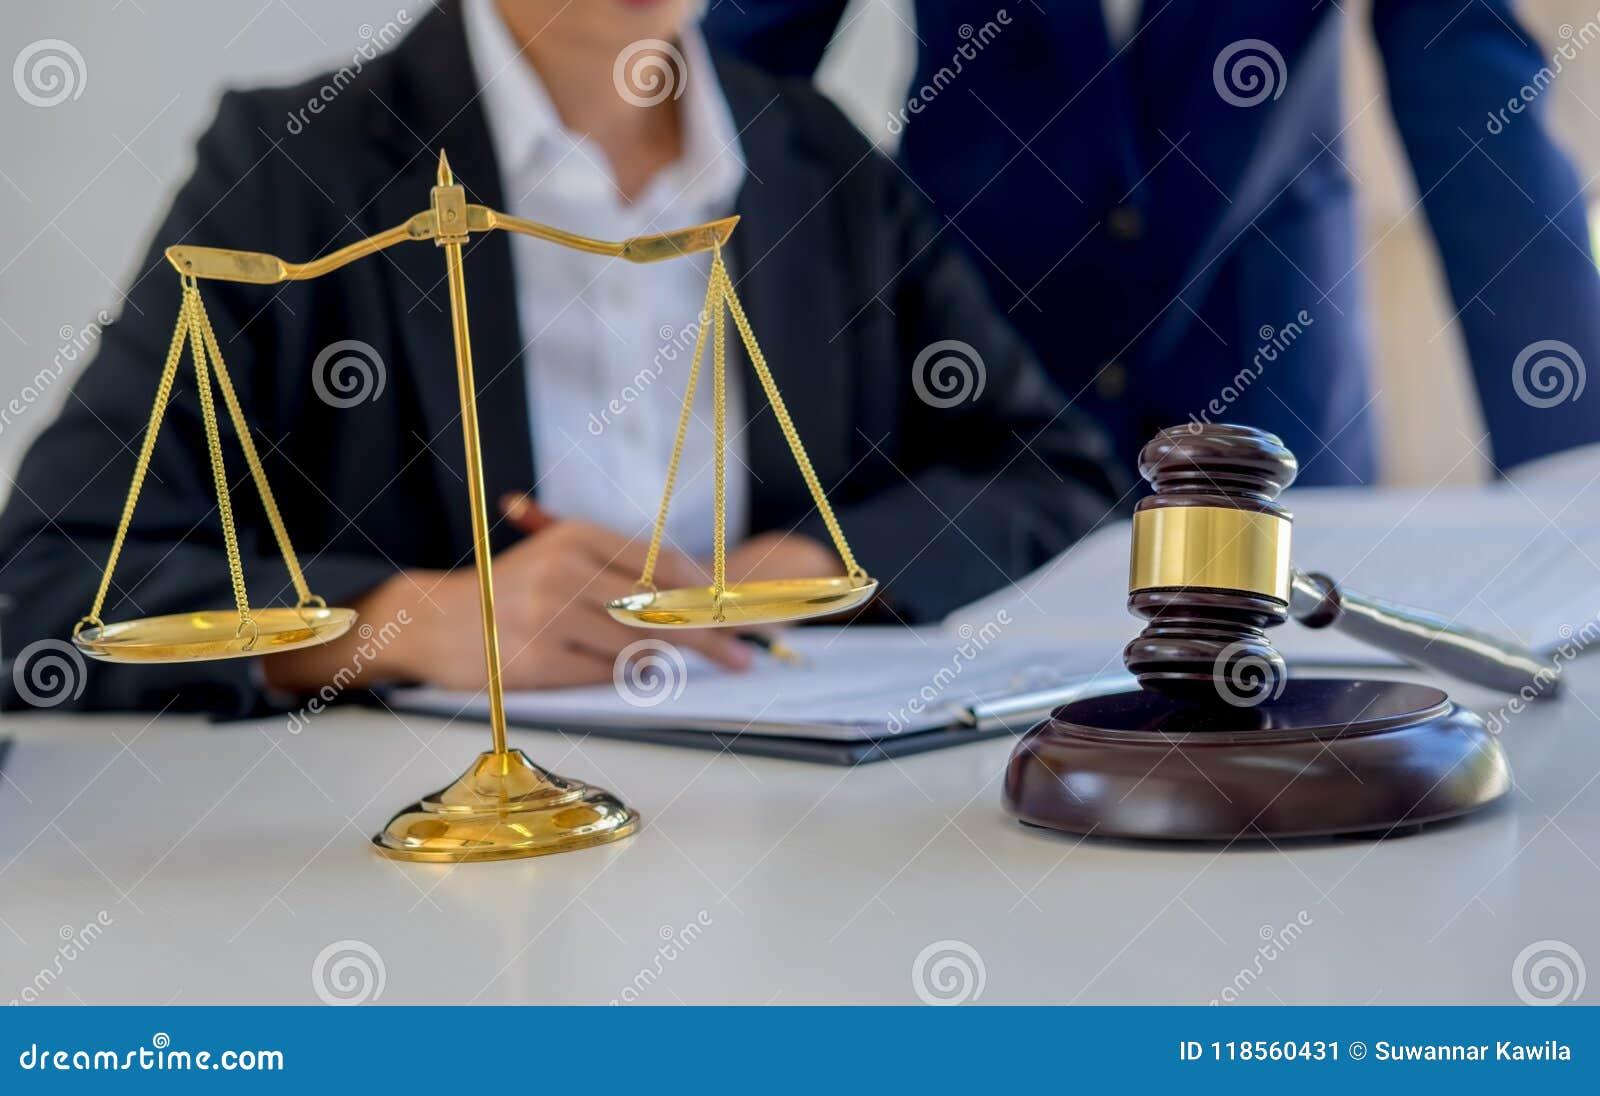 Gavel δικαστών με τους δικηγόρους δικαιοσύνης που διοργανώνουν τη συνεδρίαση των ομάδων στην εταιρία νόμου